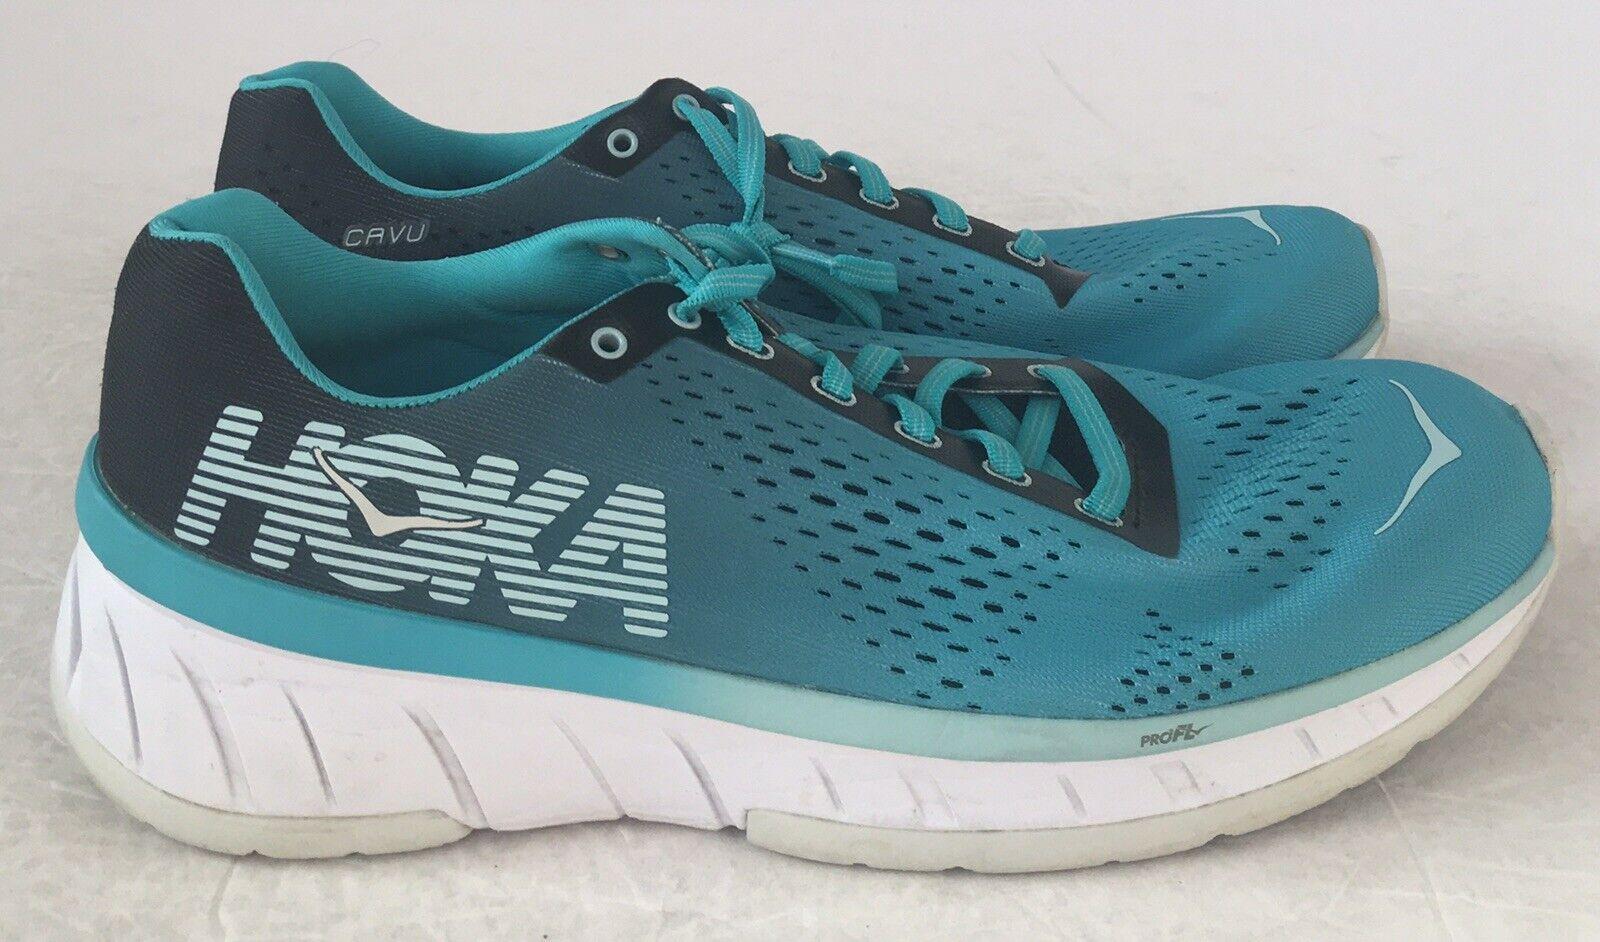 Hoka One One Women's CAVU Running shoes - Sz 9